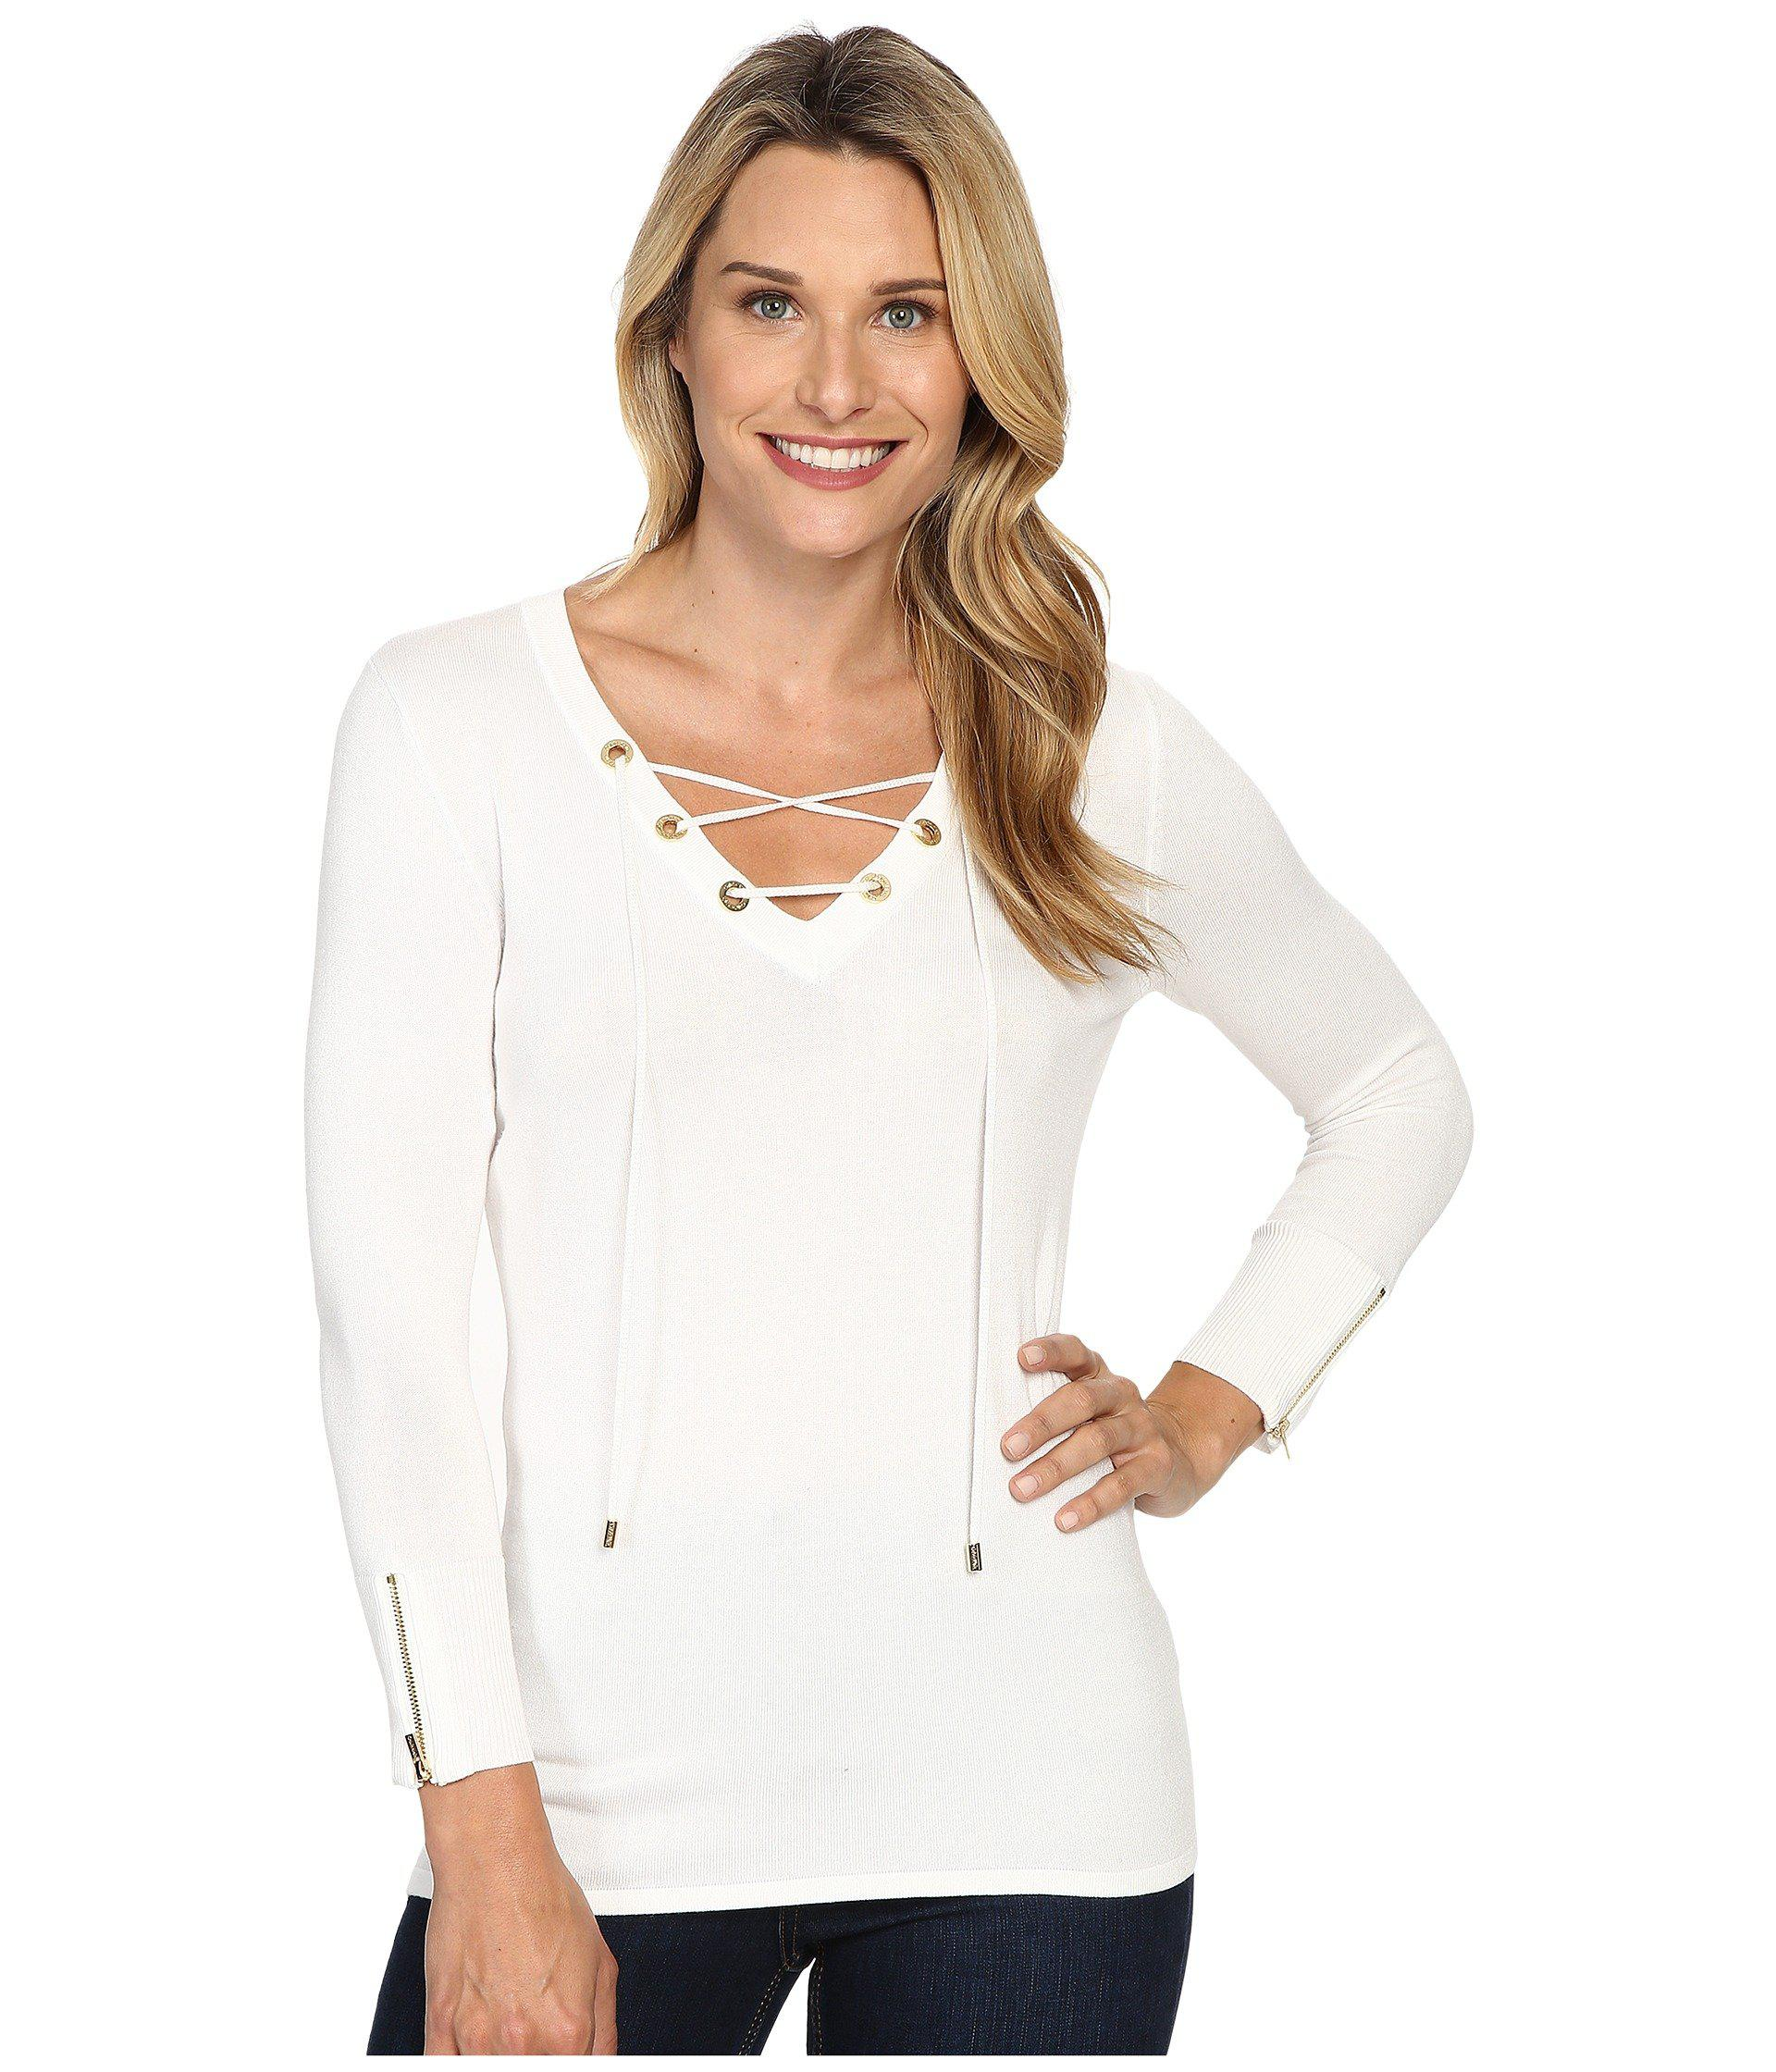 Lyst - Calvin Klein Fine Gauge Lace-up Sweater in White 04201e1e6